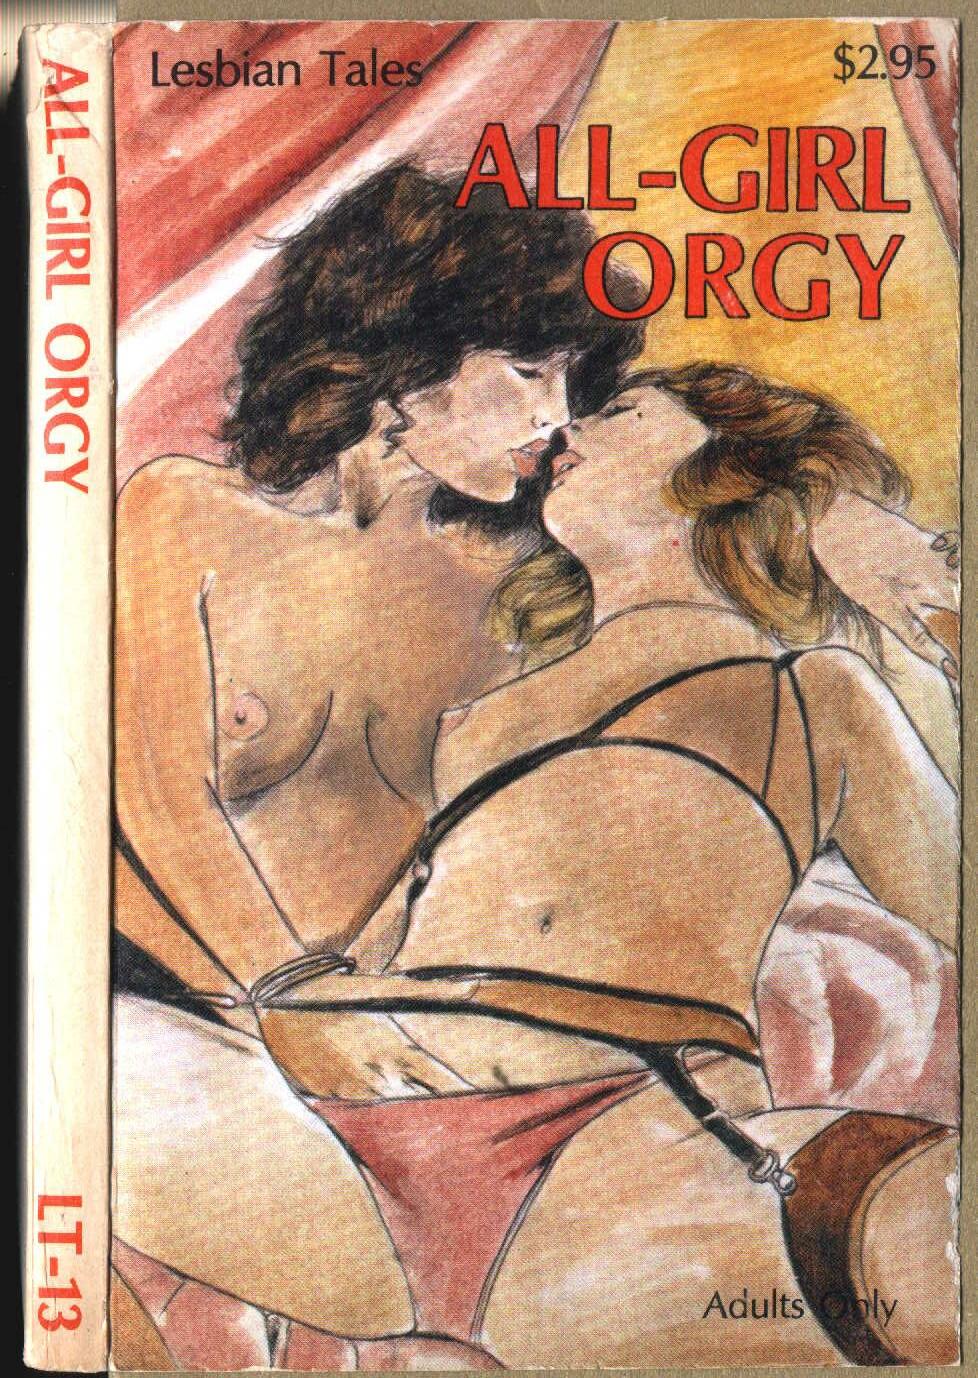 Лесбо эротики серия бульвар крутой книг